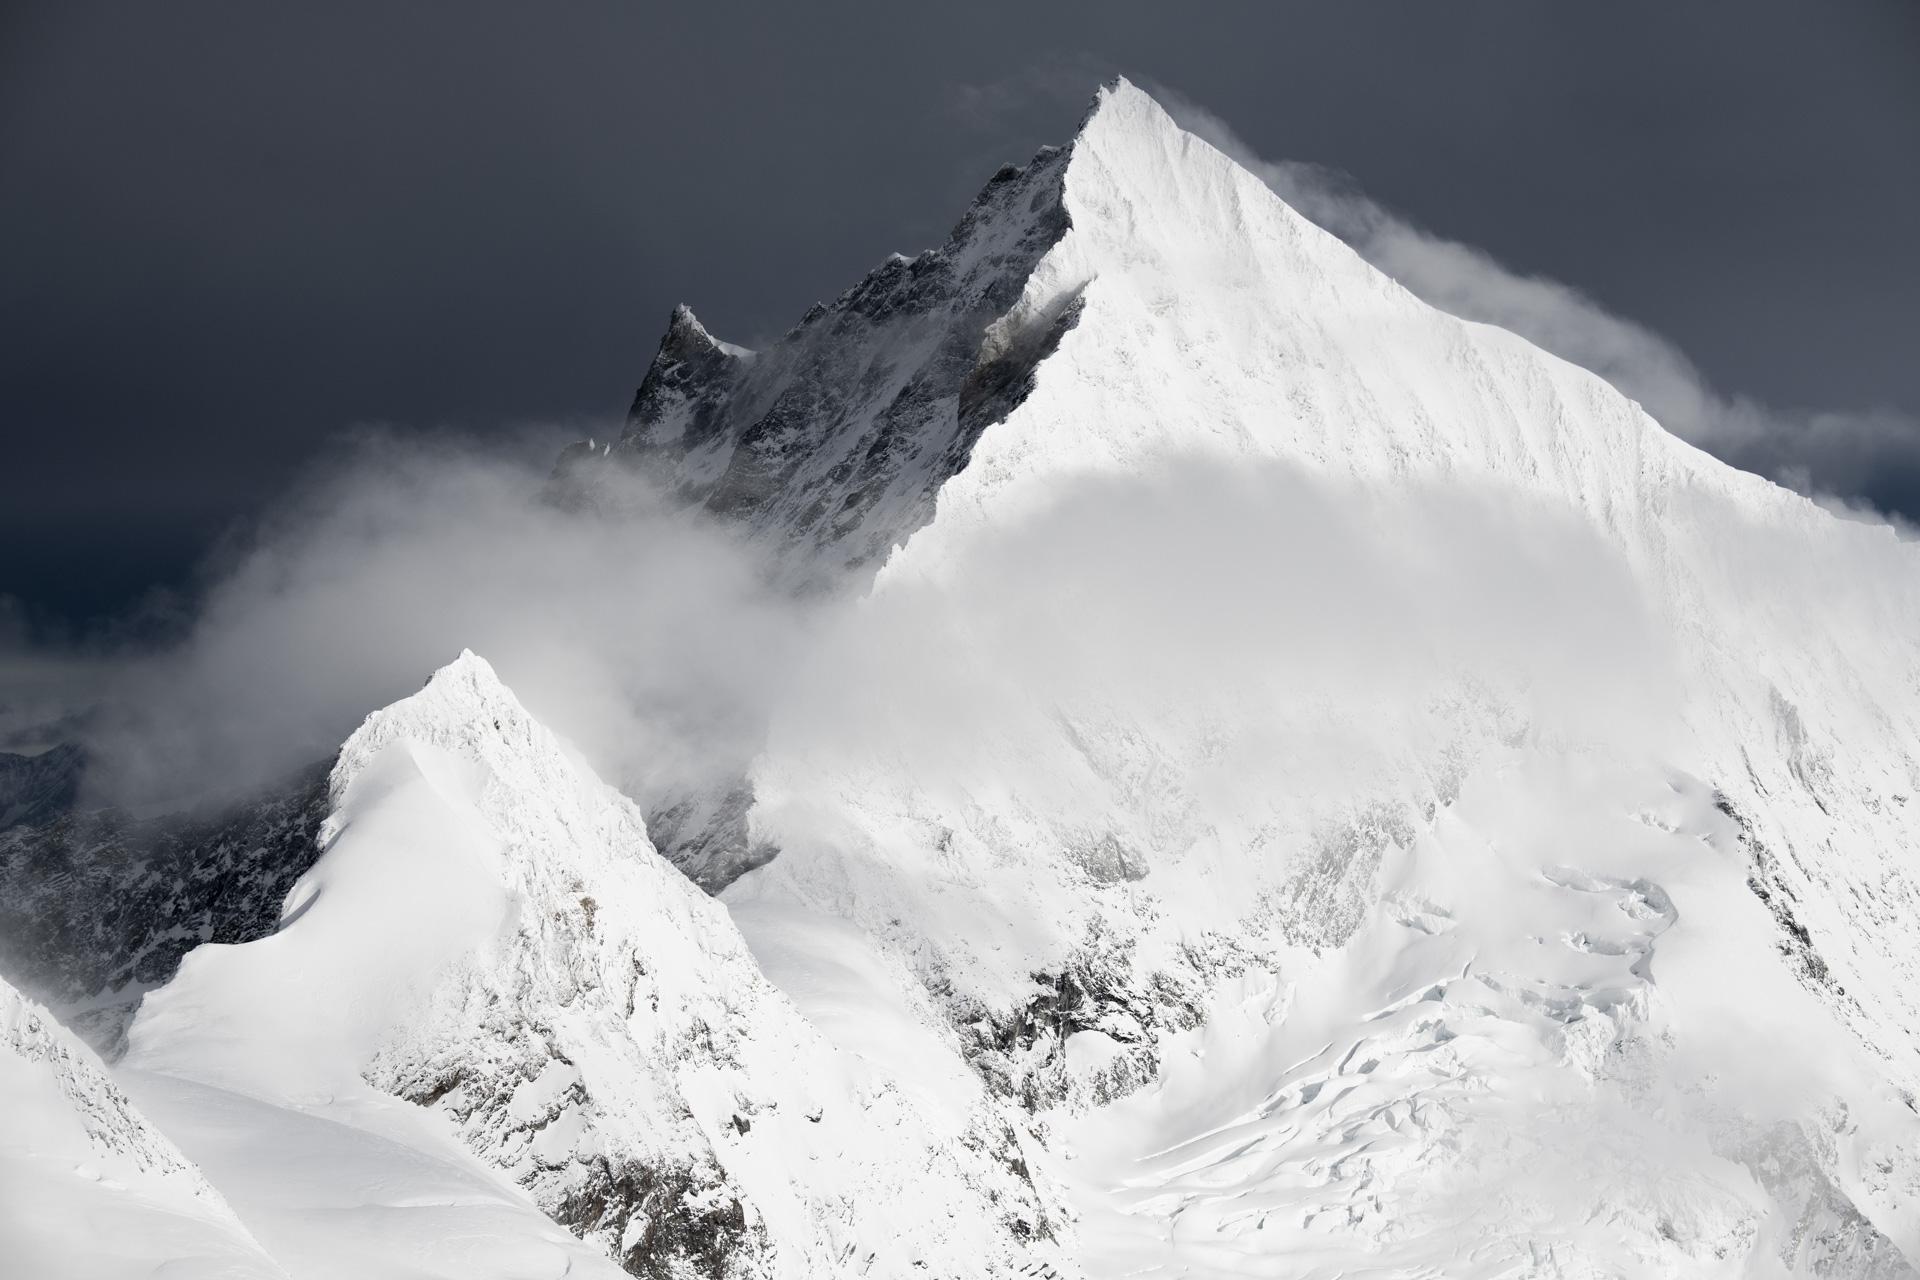 Weisshorn - Schaligrat - Schalihorn - massif montagneux photos montagnes enneigees en Suisses